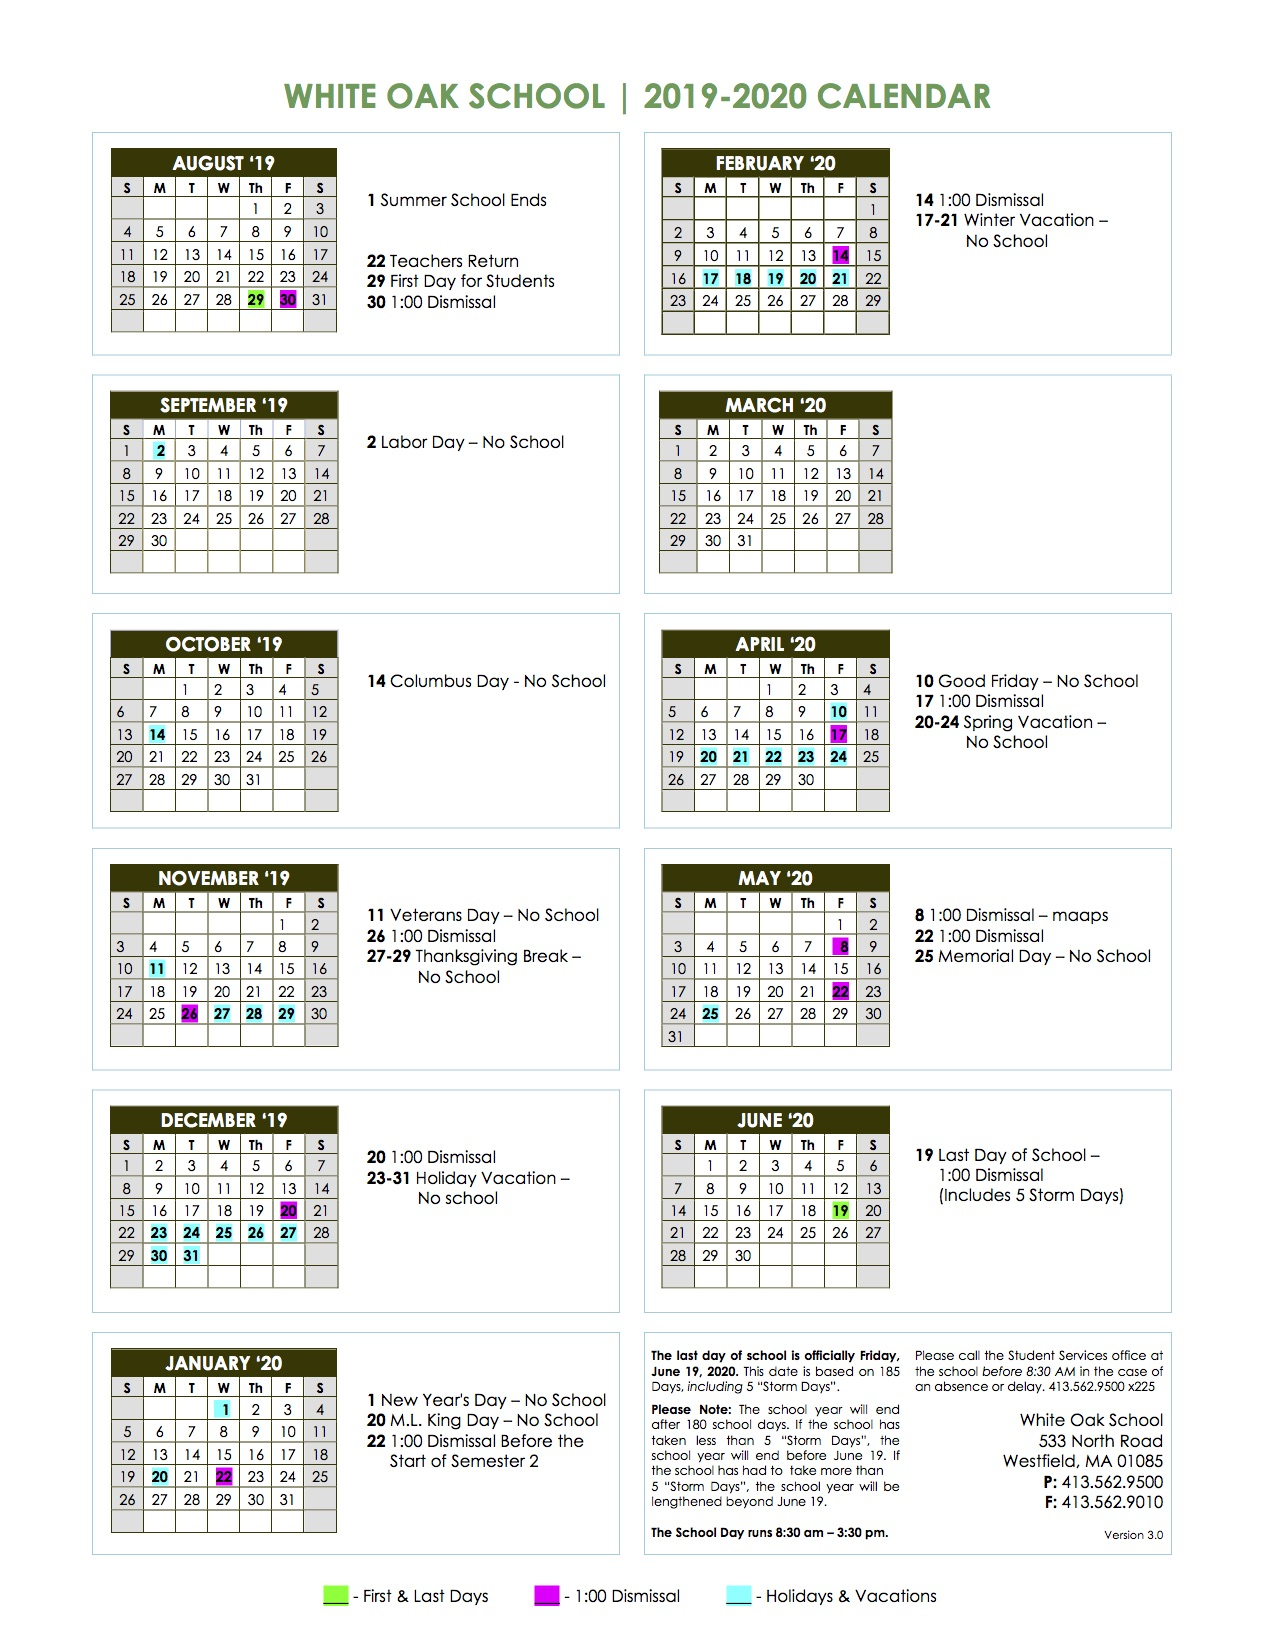 School Calendar 2019 – 2020 – White Oak School In East Hartford School Calendar 2021 2021